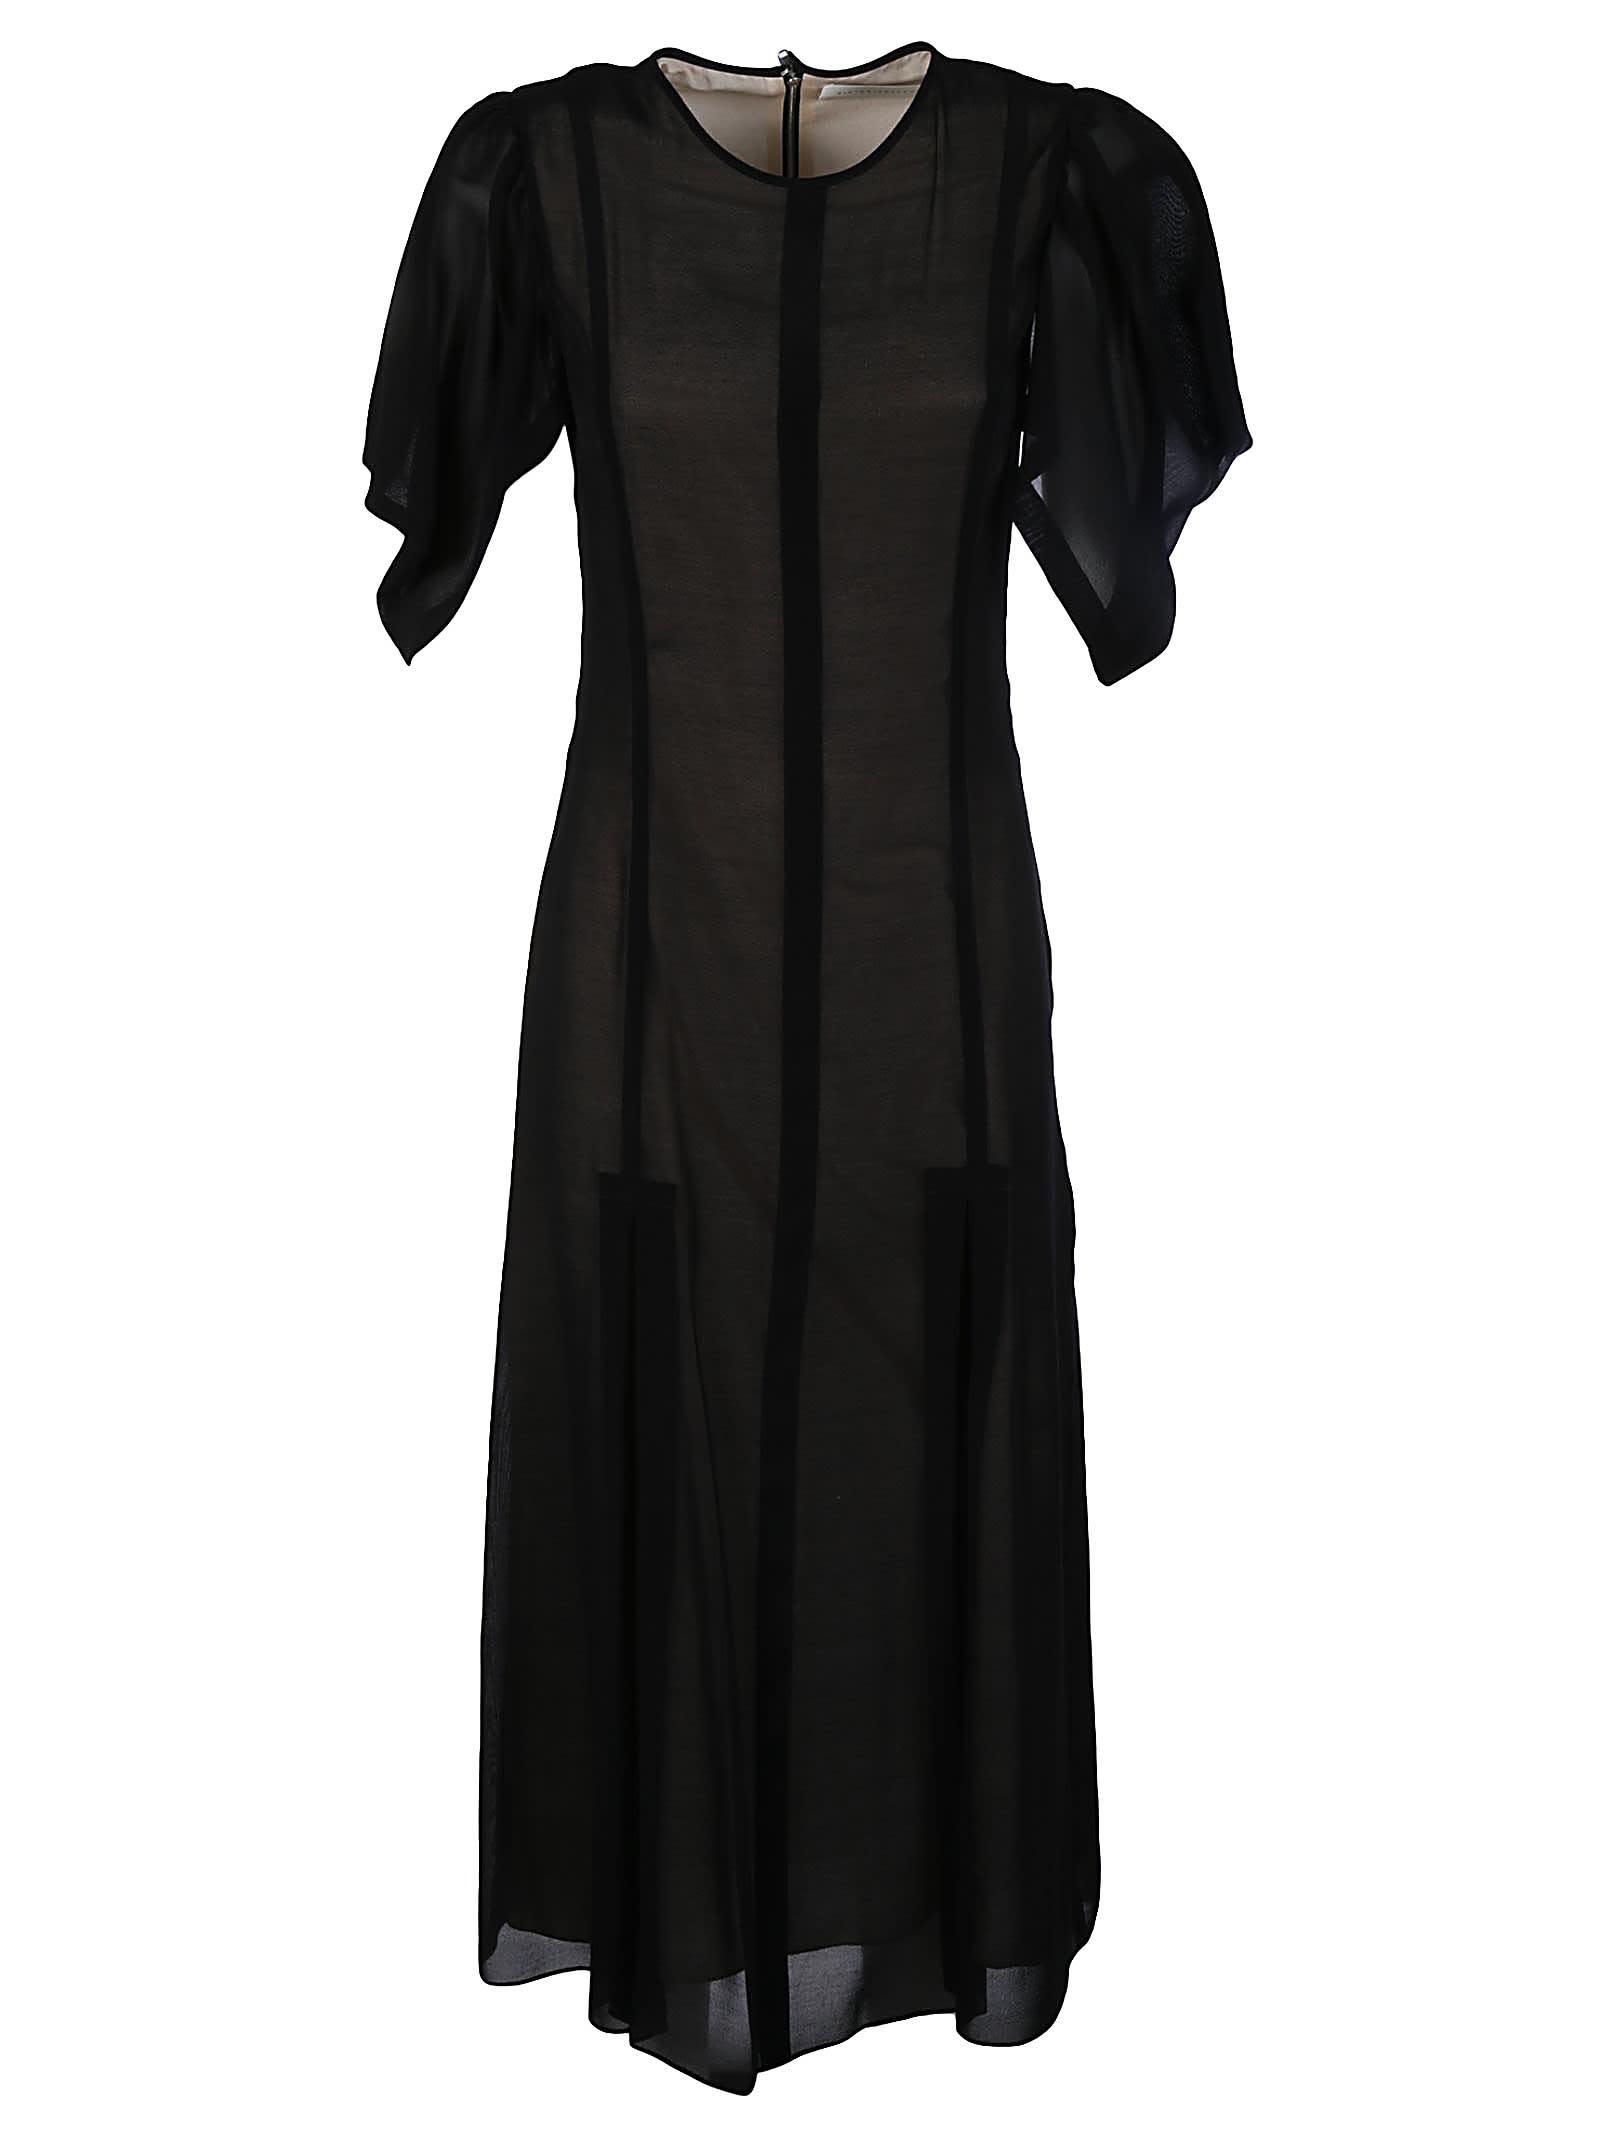 Photo of  Victoria Beckham Wide Sleeve Dress- shop Victoria Beckham  online sales